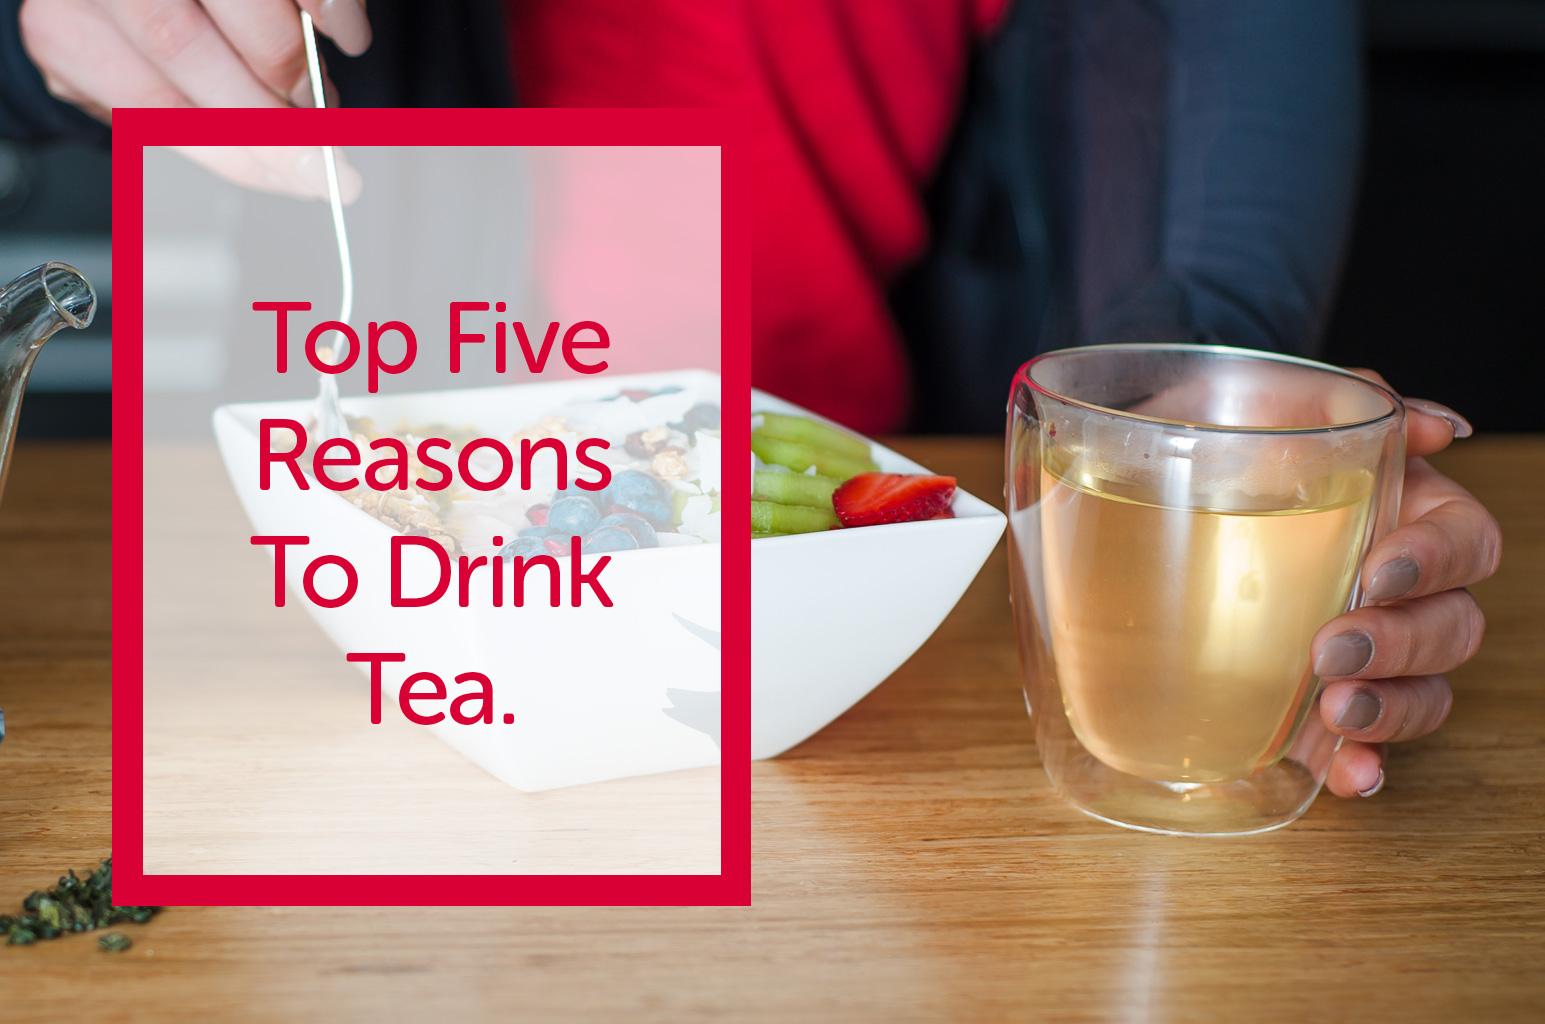 Top Five Reasons to Drink Tea